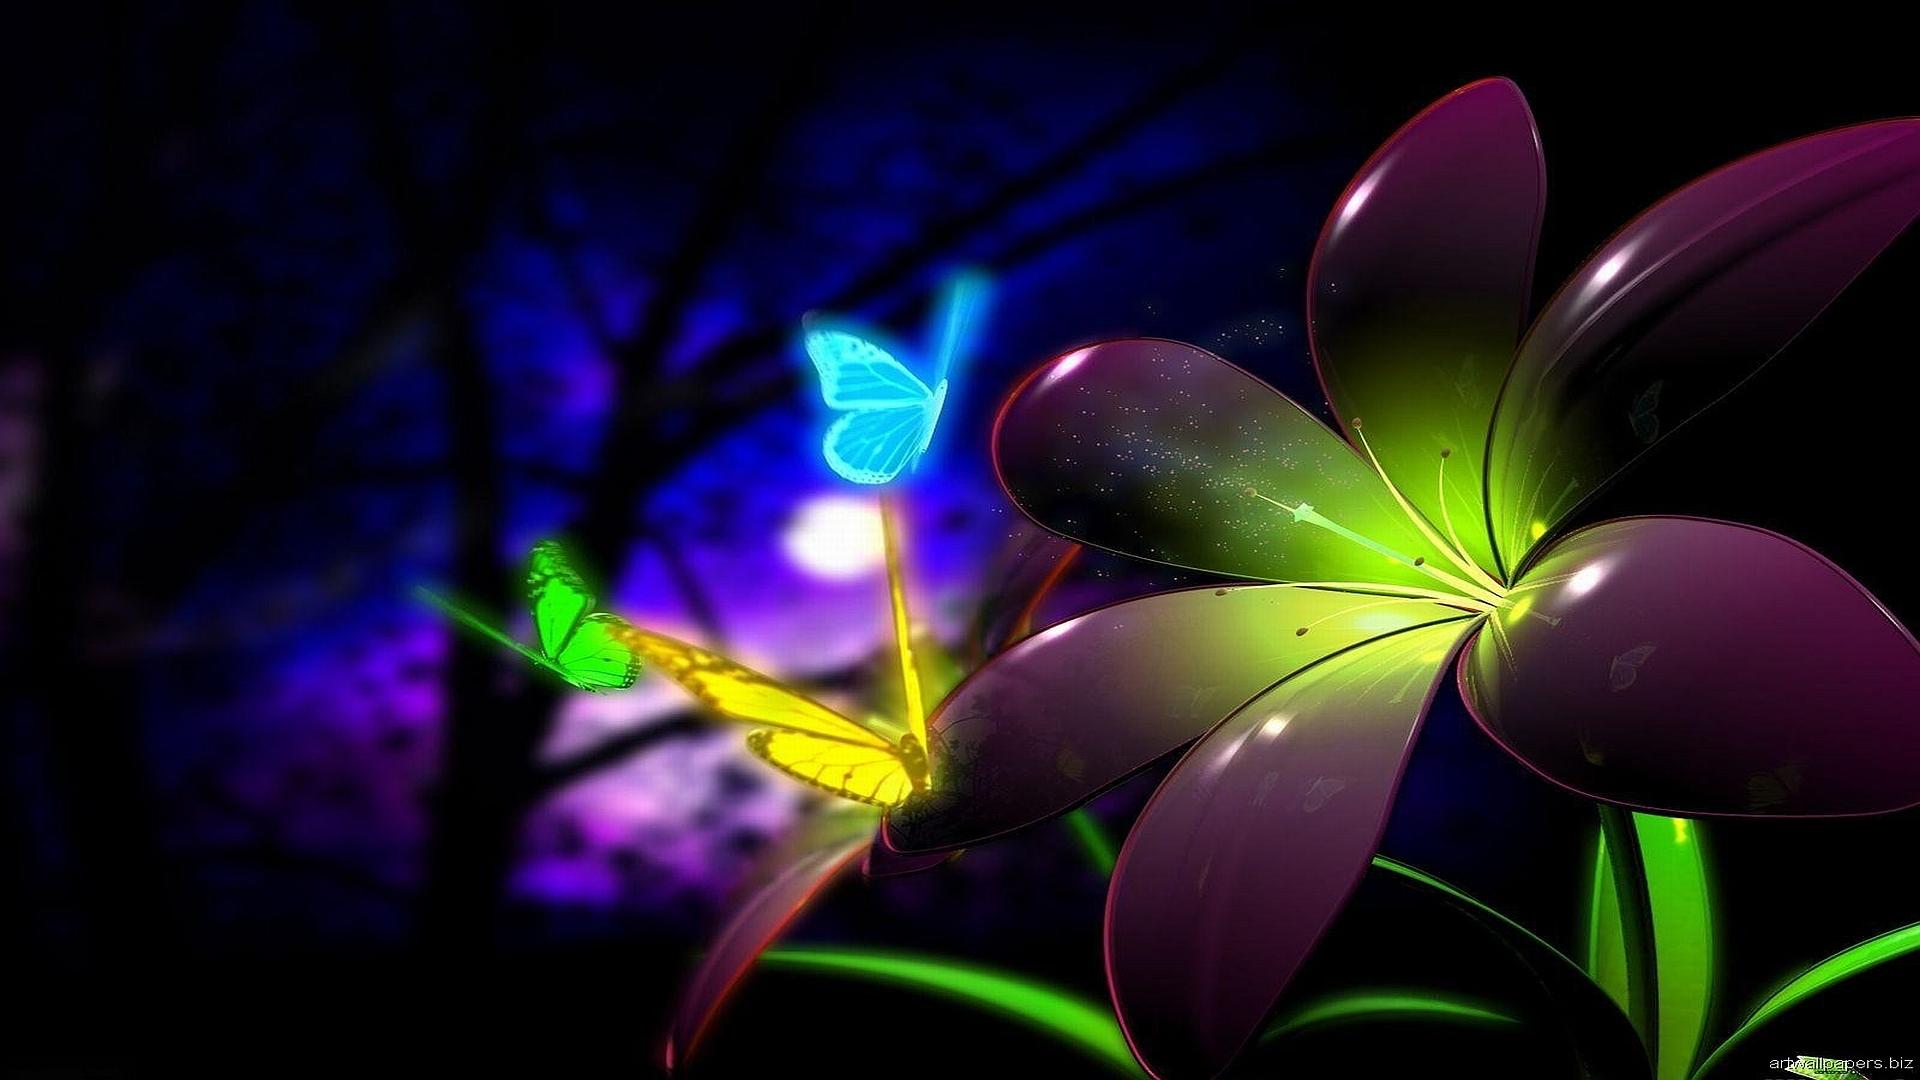 Neon Butterflies Computer Wallpapers Desktop Backgrounds 1920x1080 1920x1080